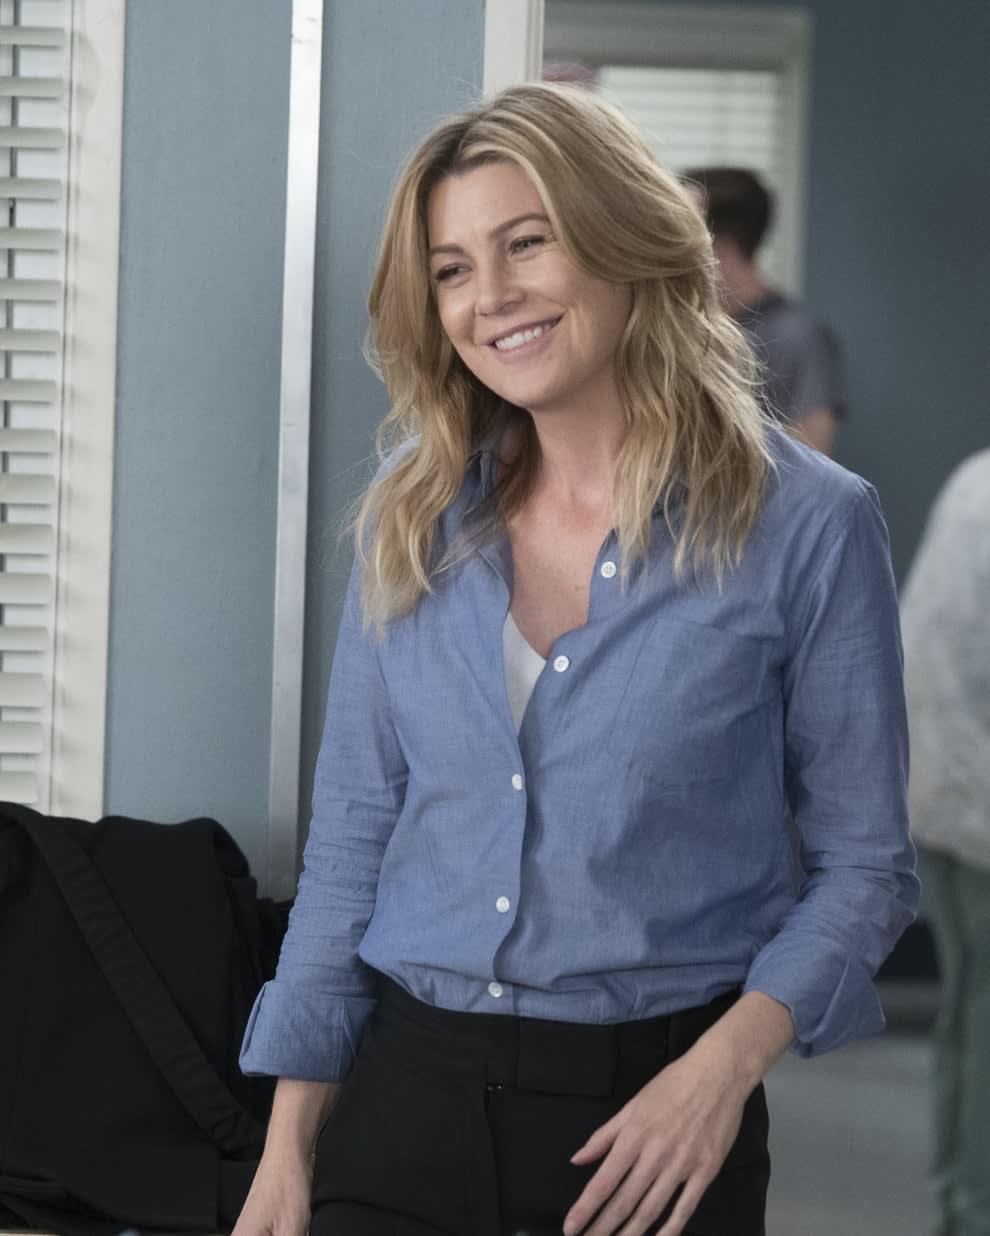 Ellen Pompeo smiles to someone off-camera on Grey's Anatomy